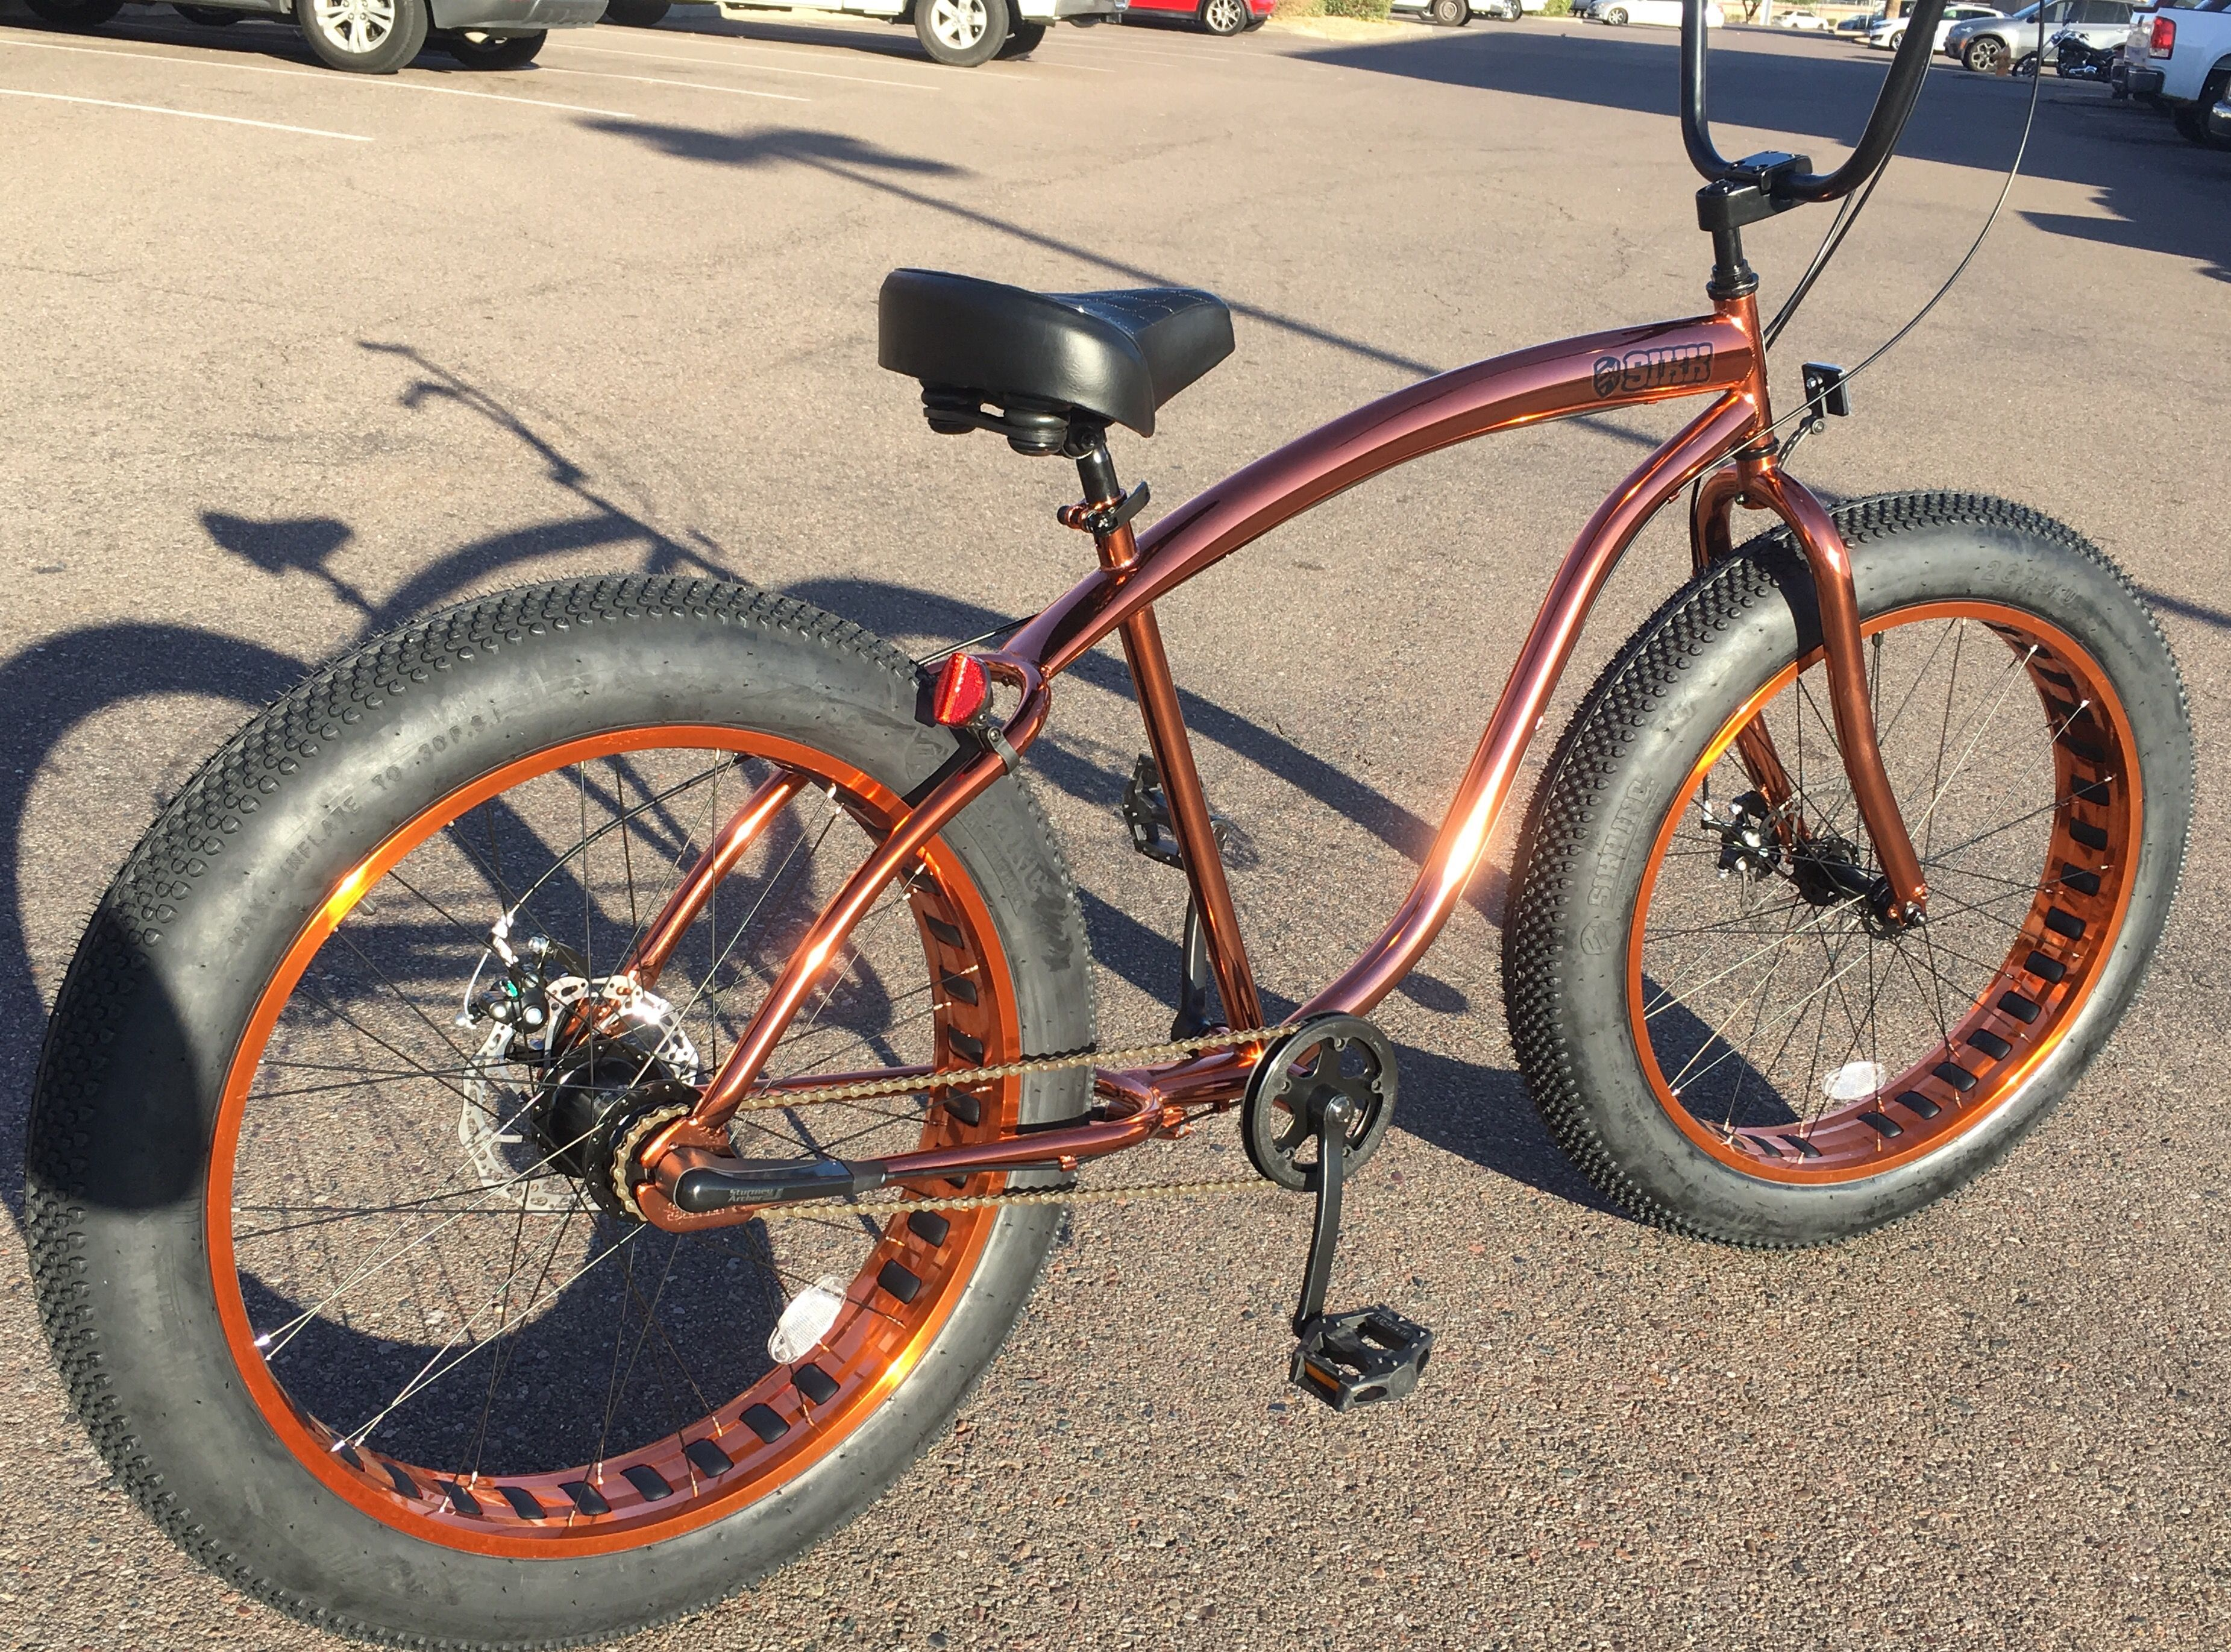 Pin On Sikk Copperhead Fat Tire Cruiser